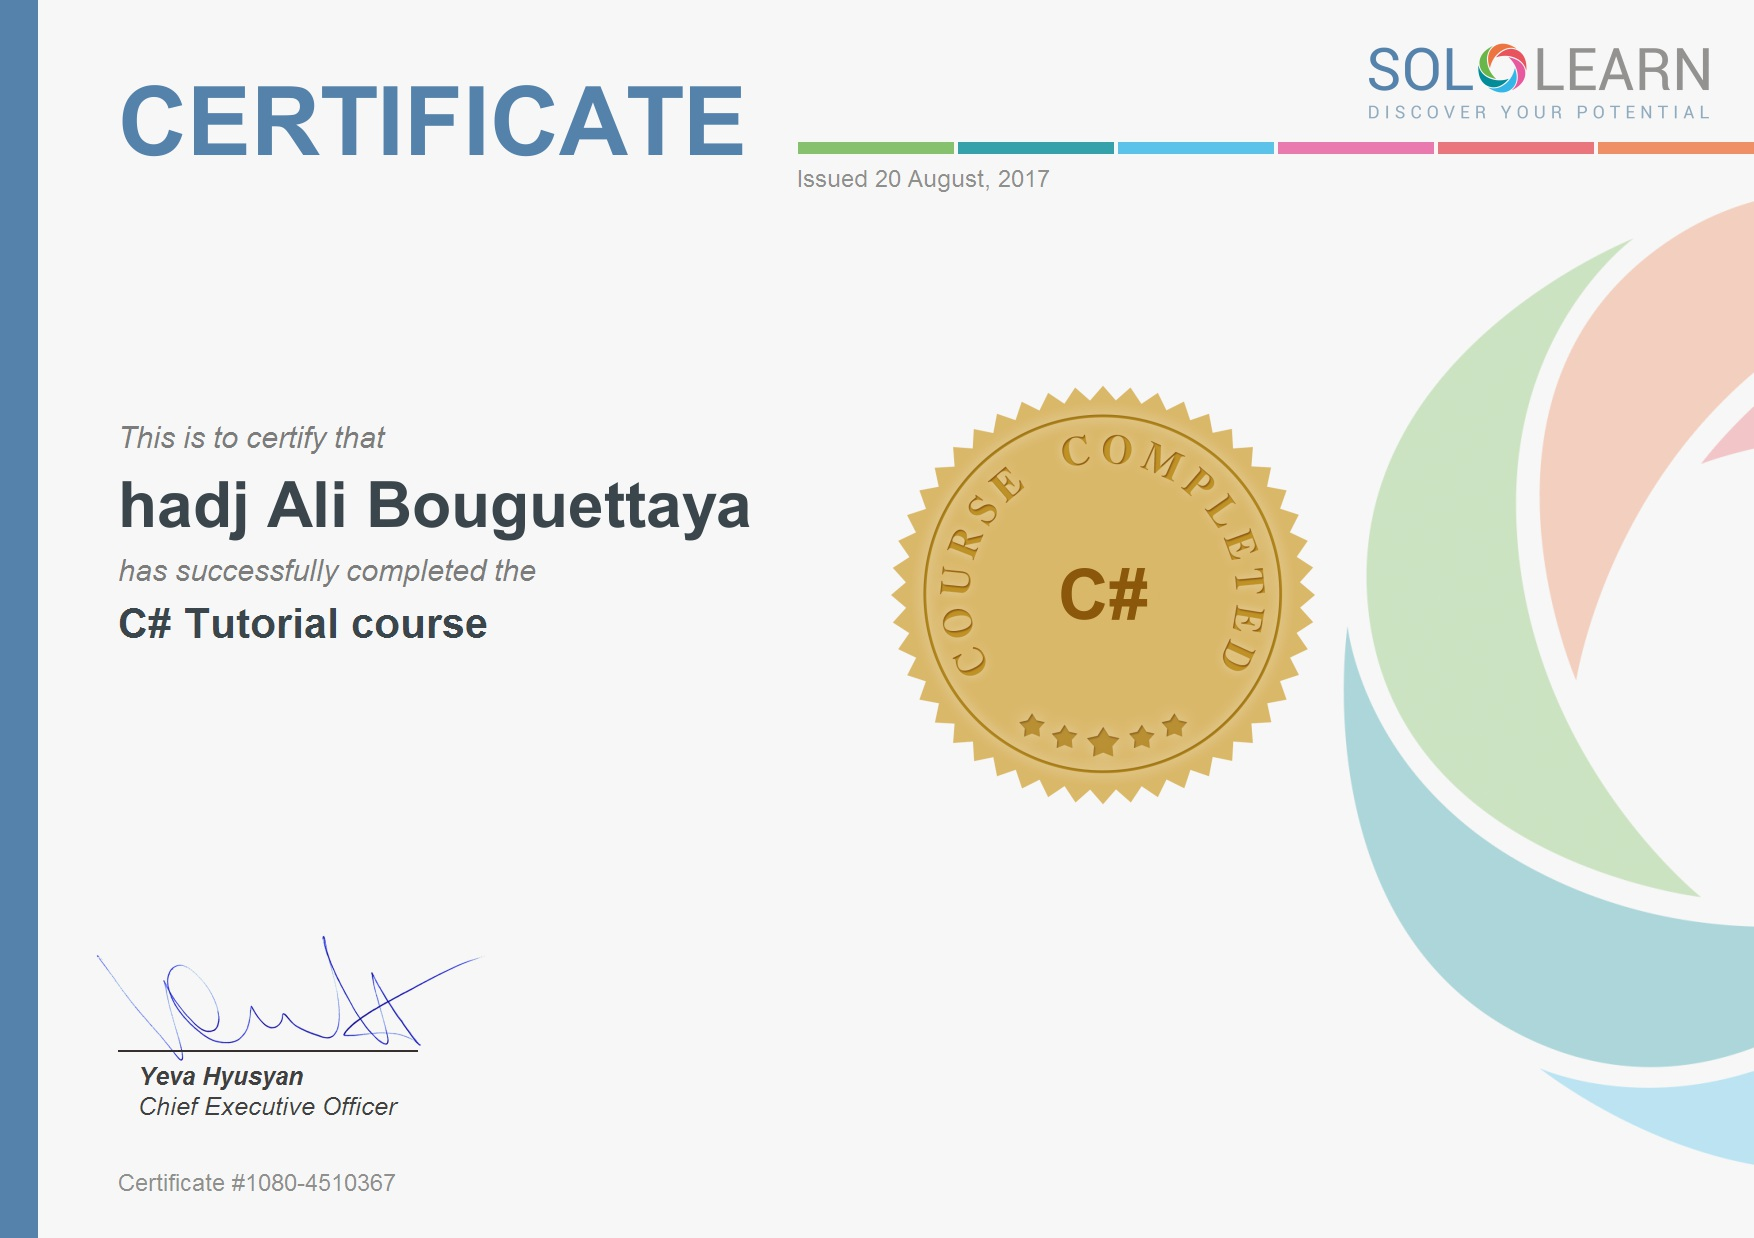 Hadj Ali Bouguettaya